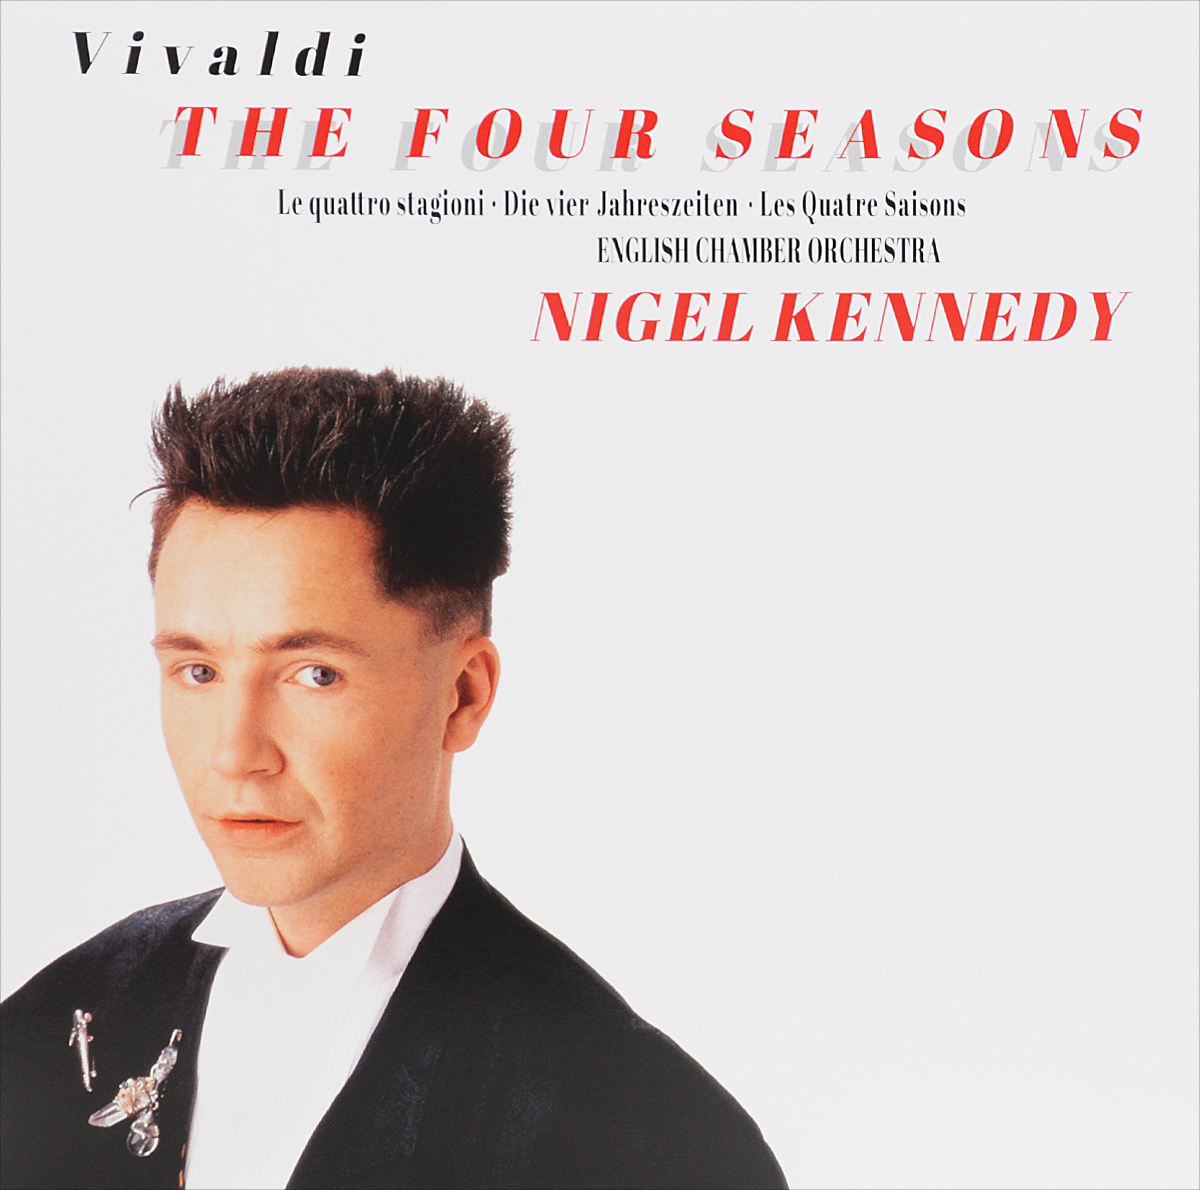 Нейджел Кеннеди,English Chamber Orchestra Nigel Kennedy. Vivaldi. The Four Seasons (LP) wisher vol 1 nigel